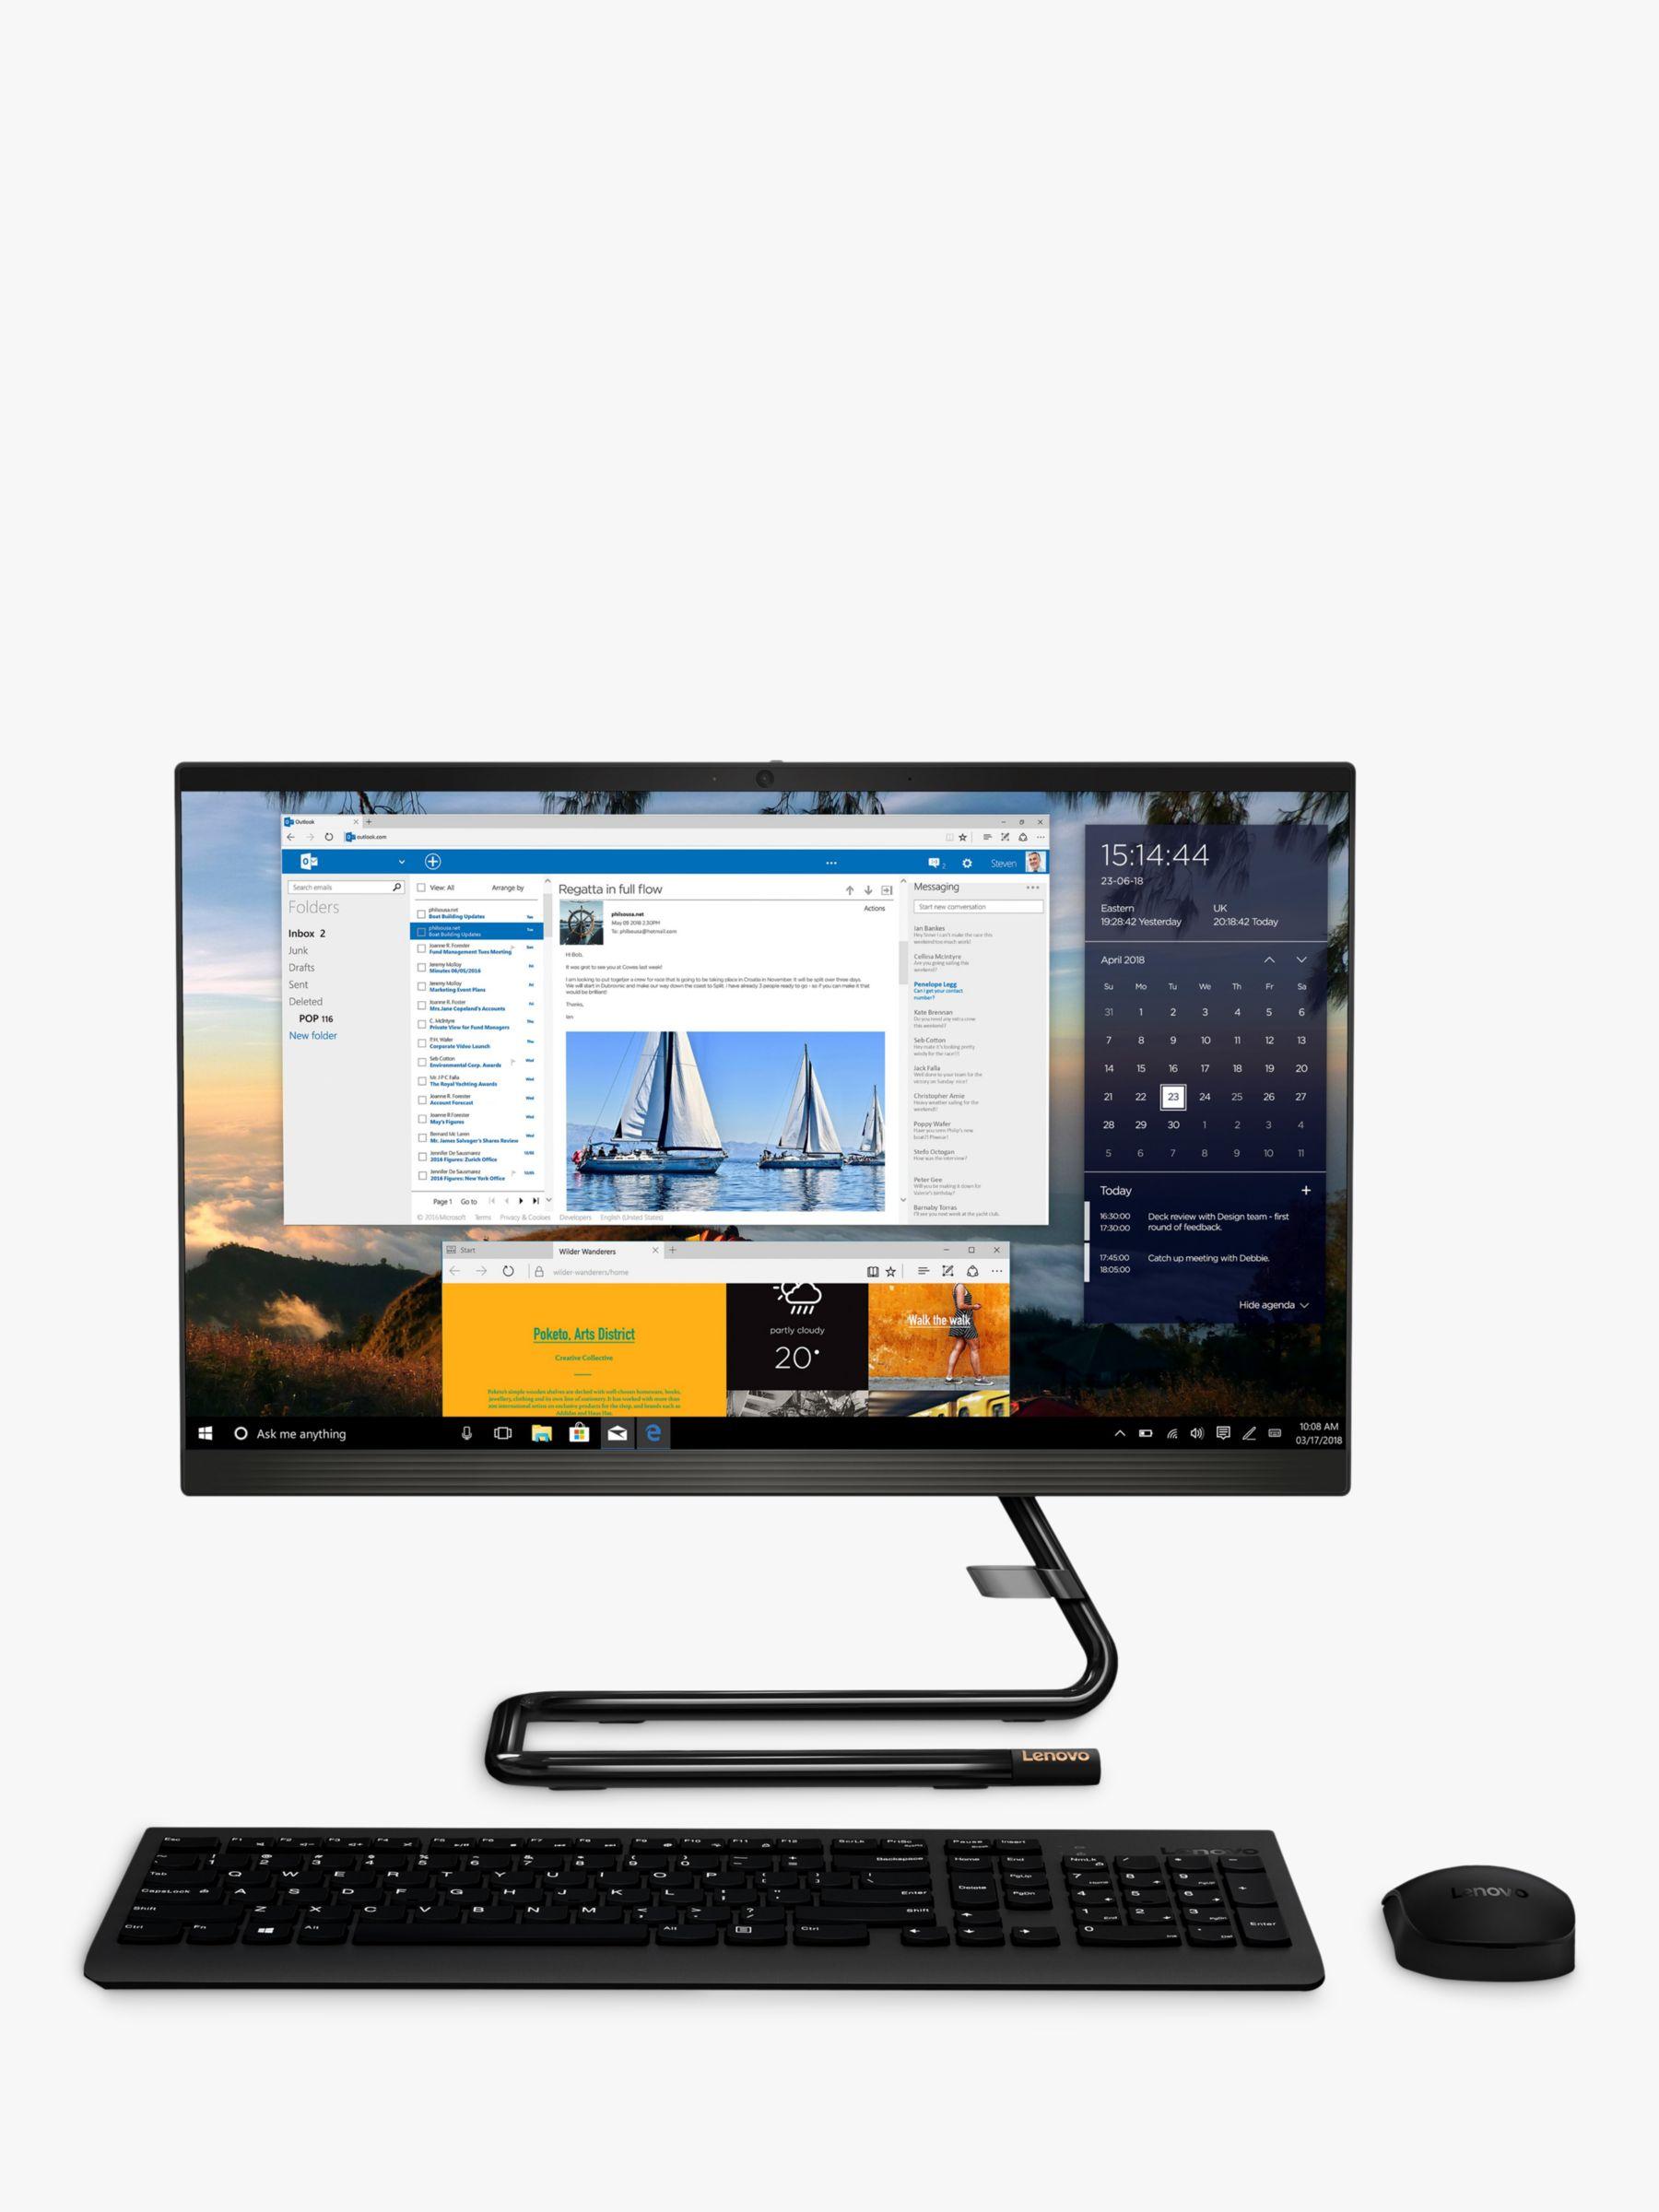 Lenovo Lenovo IdeaCentre A340-22IWL All-in-One Desktop PC, Intel Core i3, 8GB RAM, 128GB HDD, 21.5 Full HD, Business Black